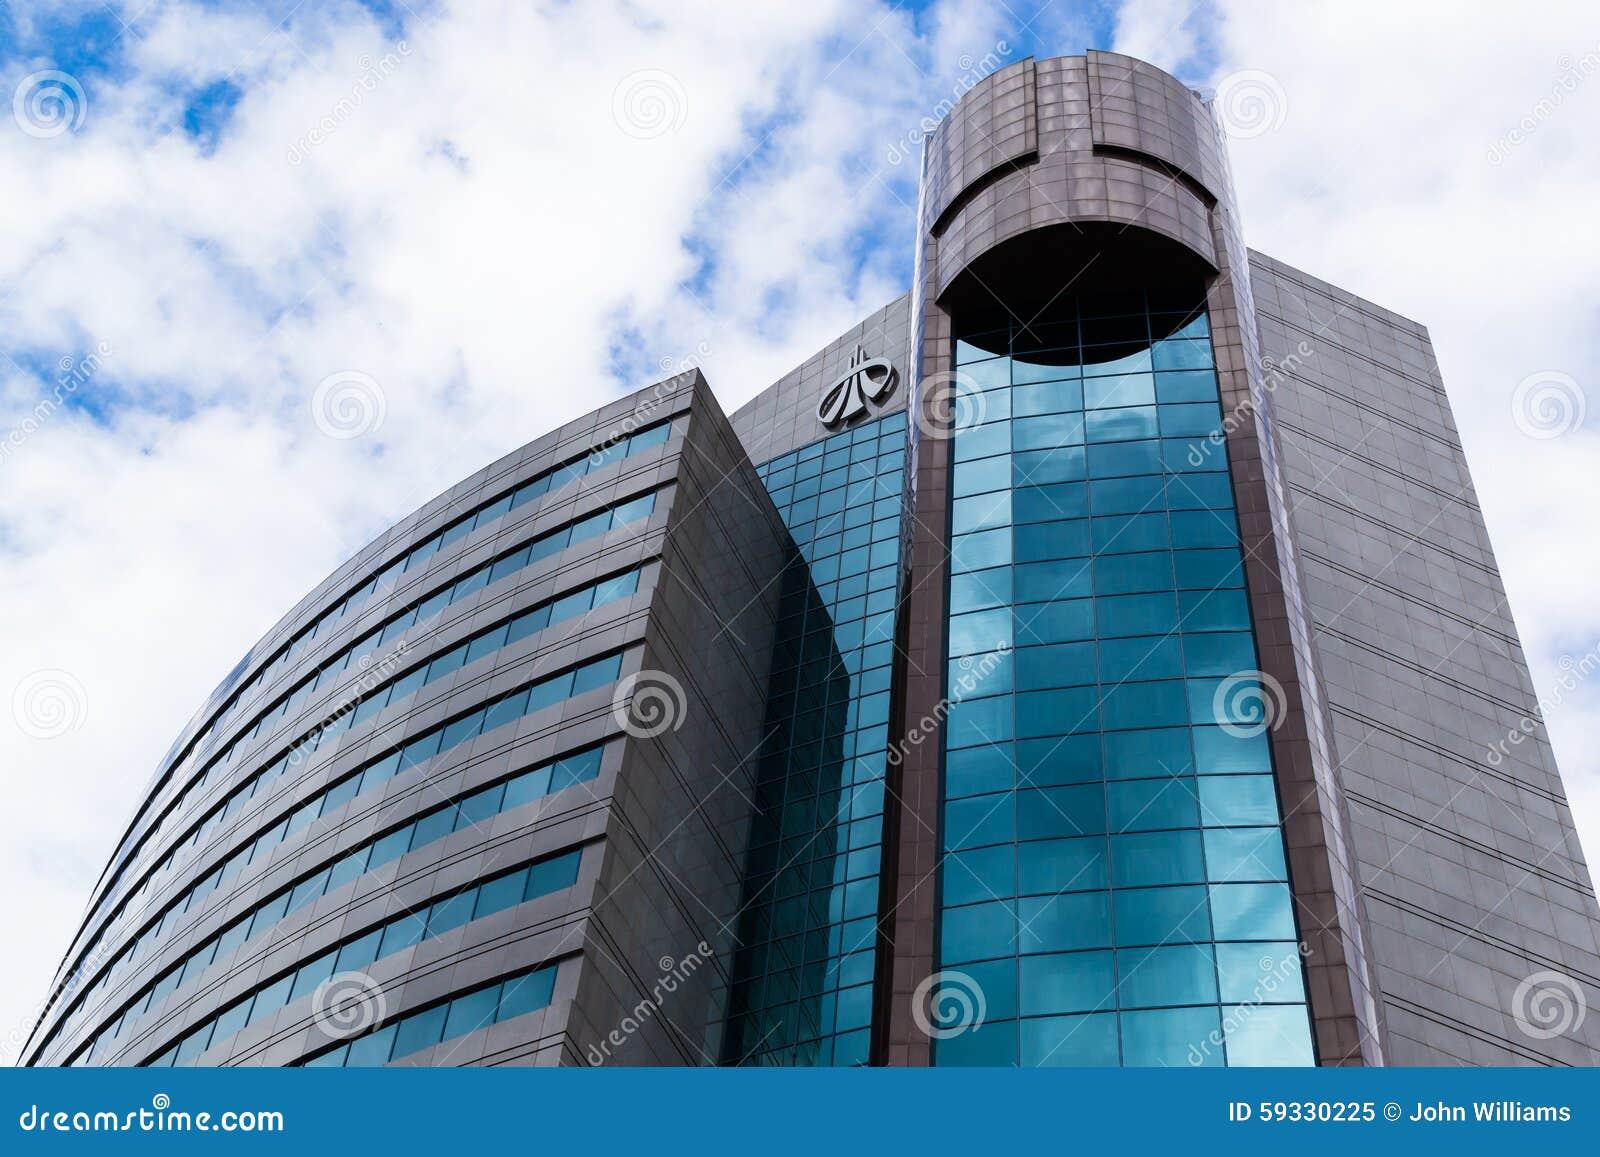 Ural sib russian bank exterior editorial image image for Modern bank building design